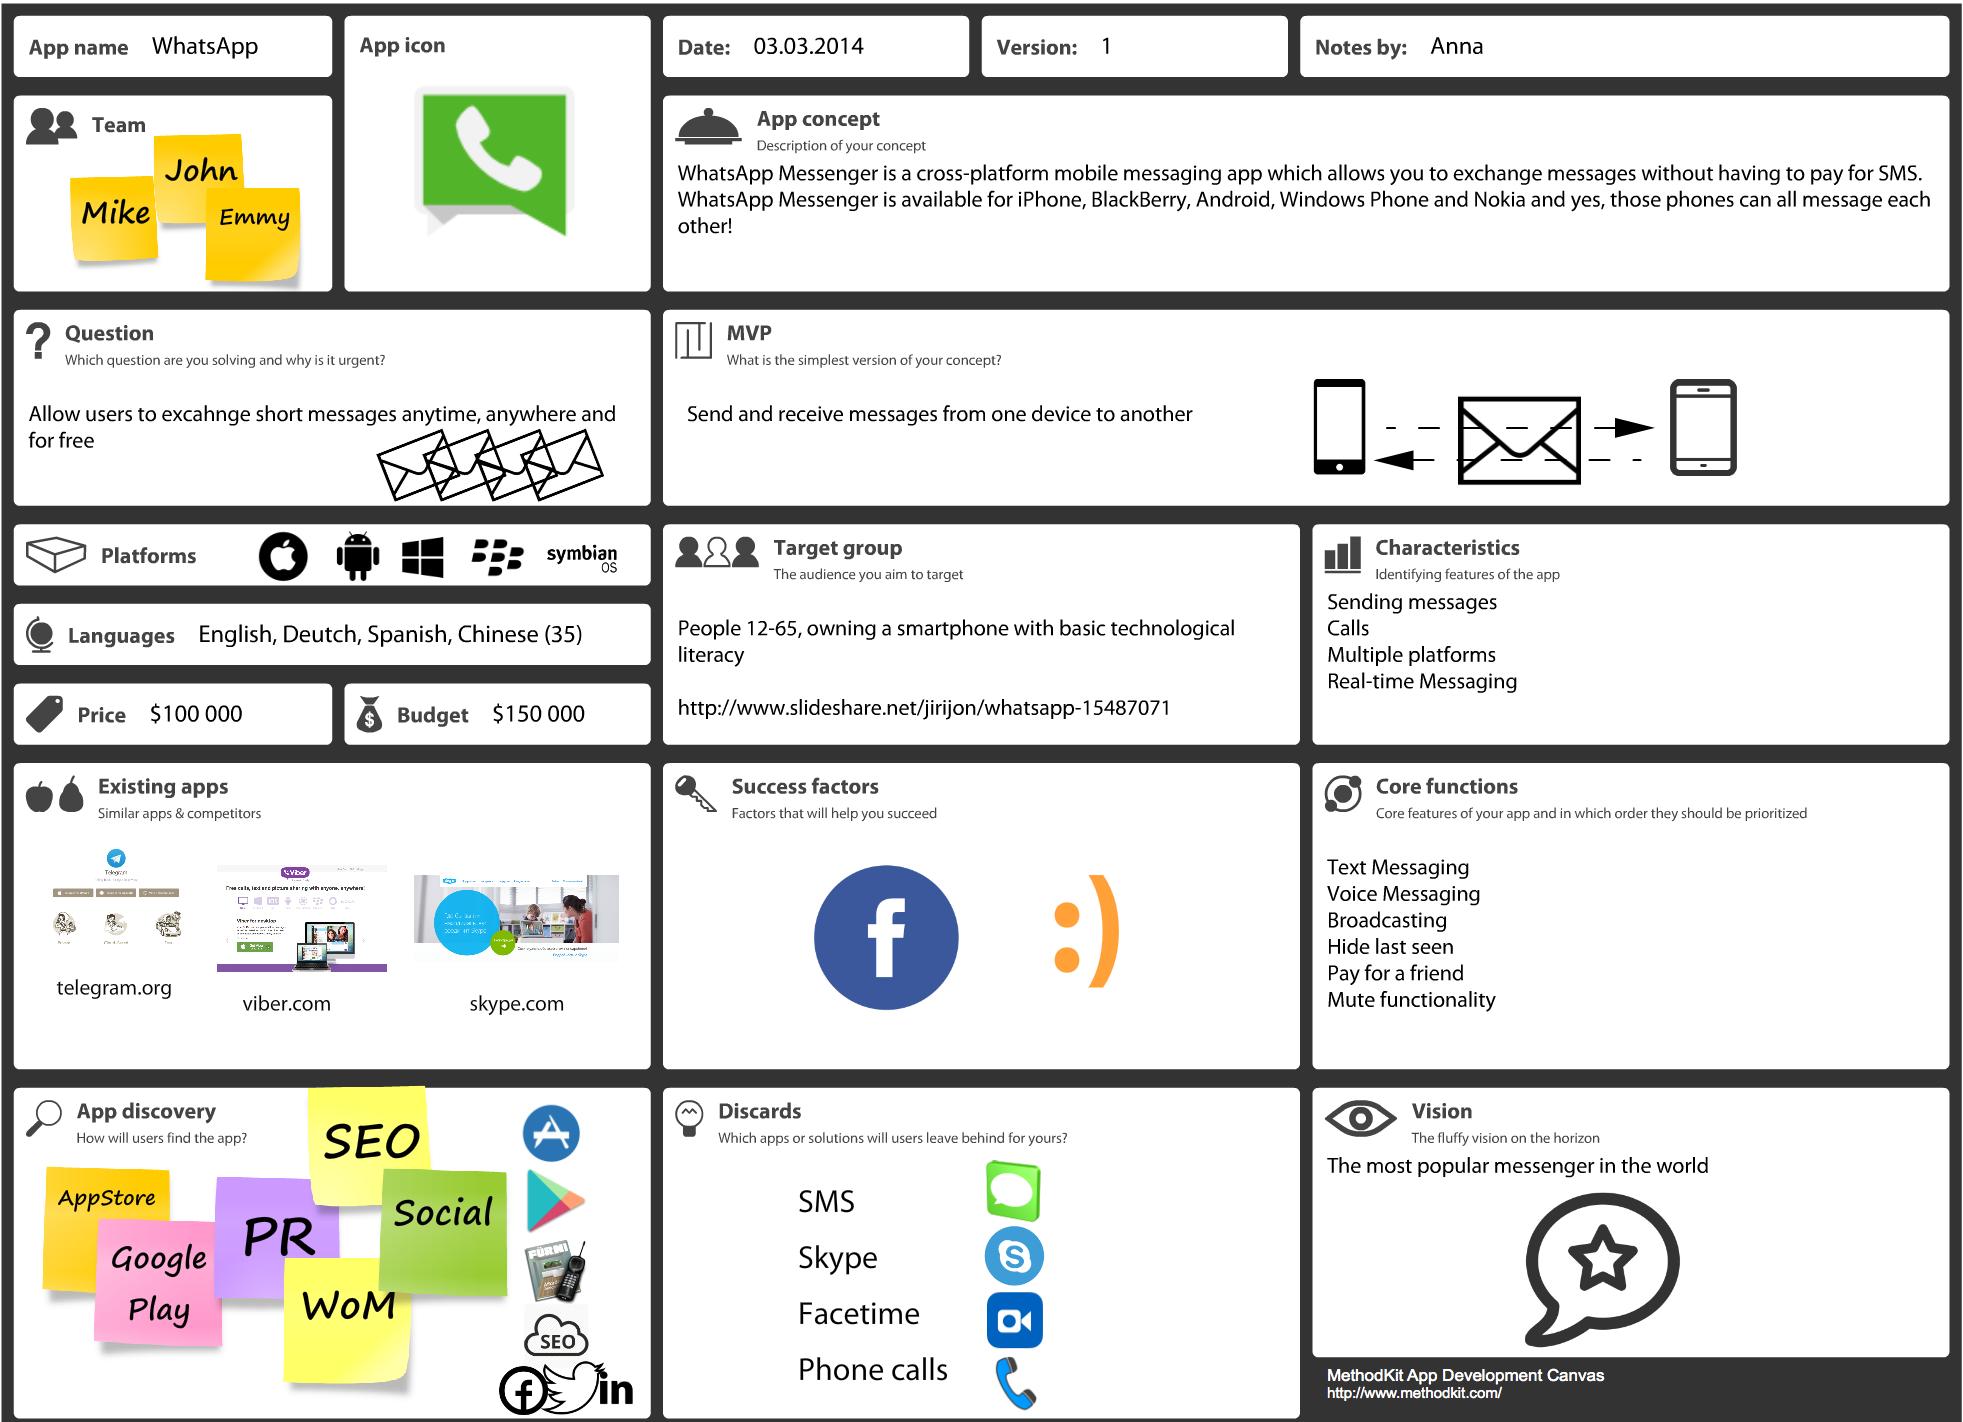 Introducing App Development Canvas In Realtimeboard App Development Web App Design Development